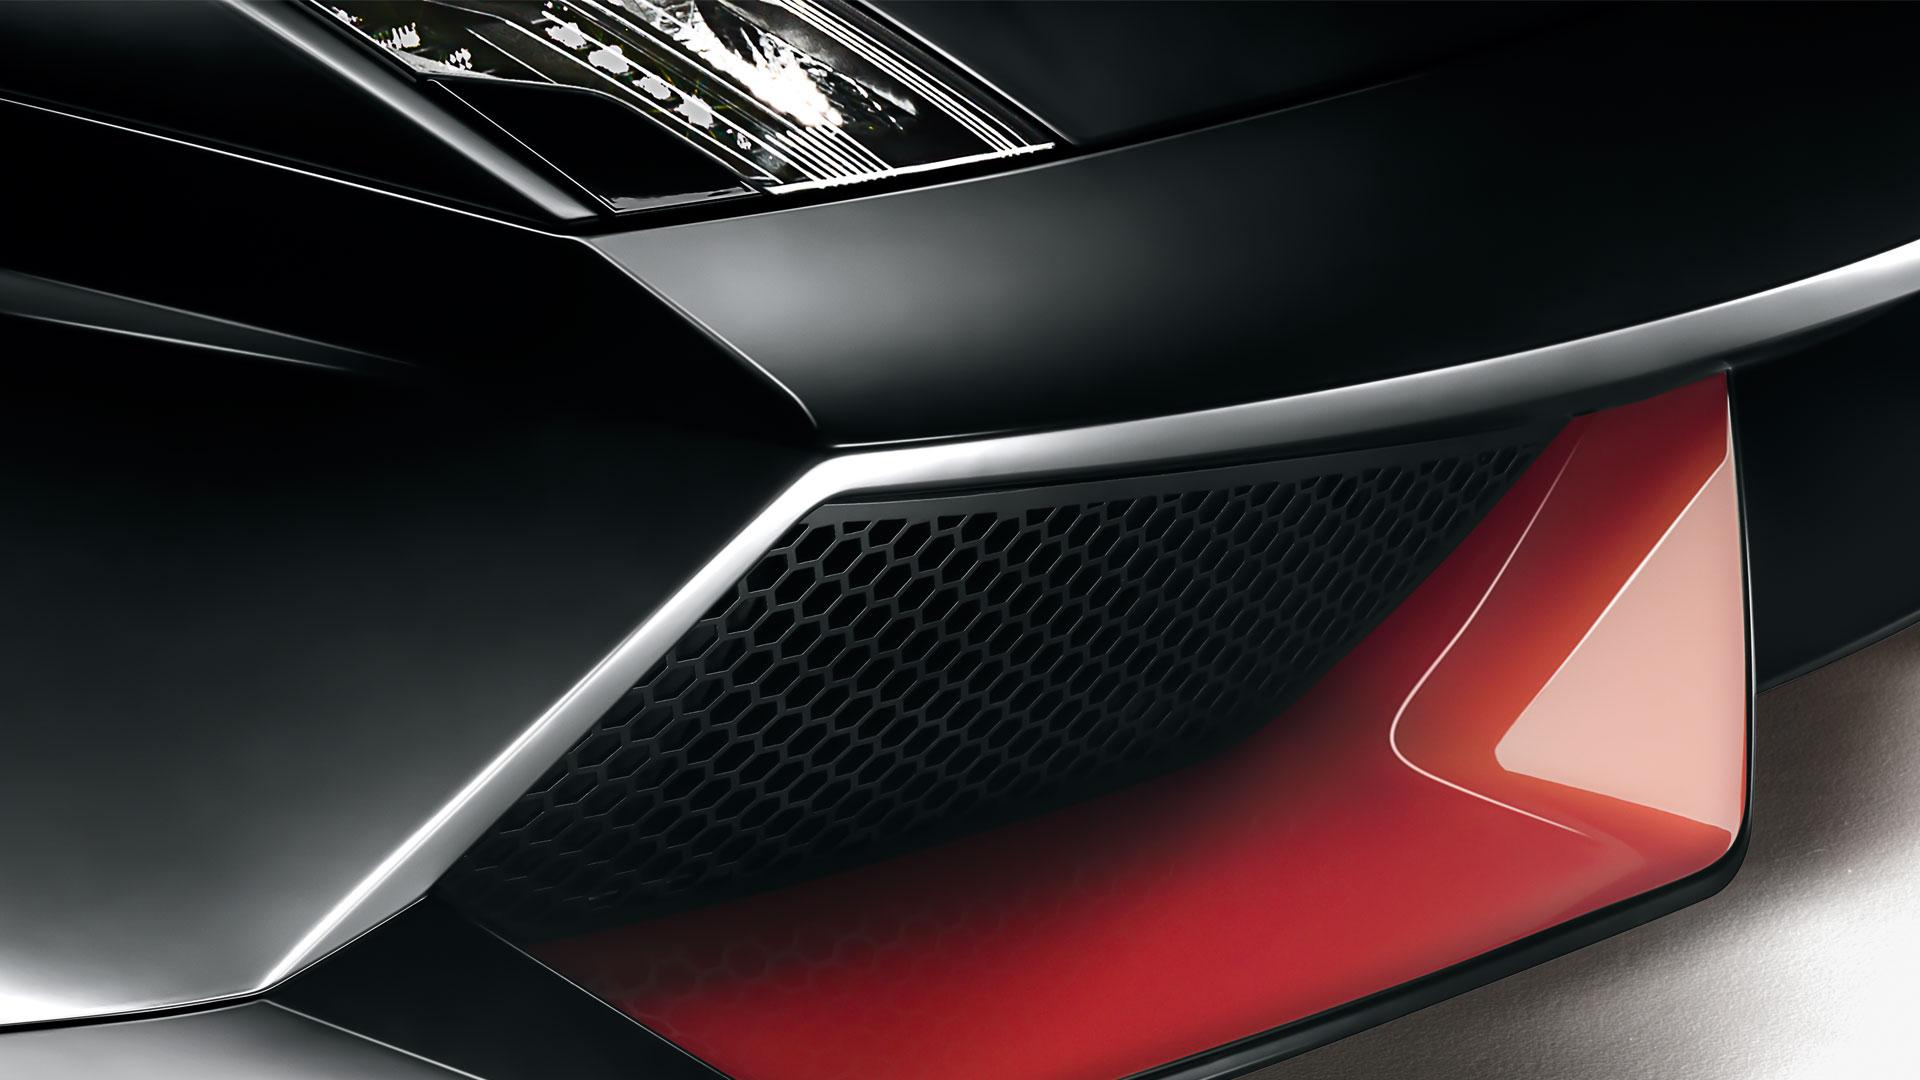 Lamborghini Aventador Car Hd Wallpapers Archives My Site